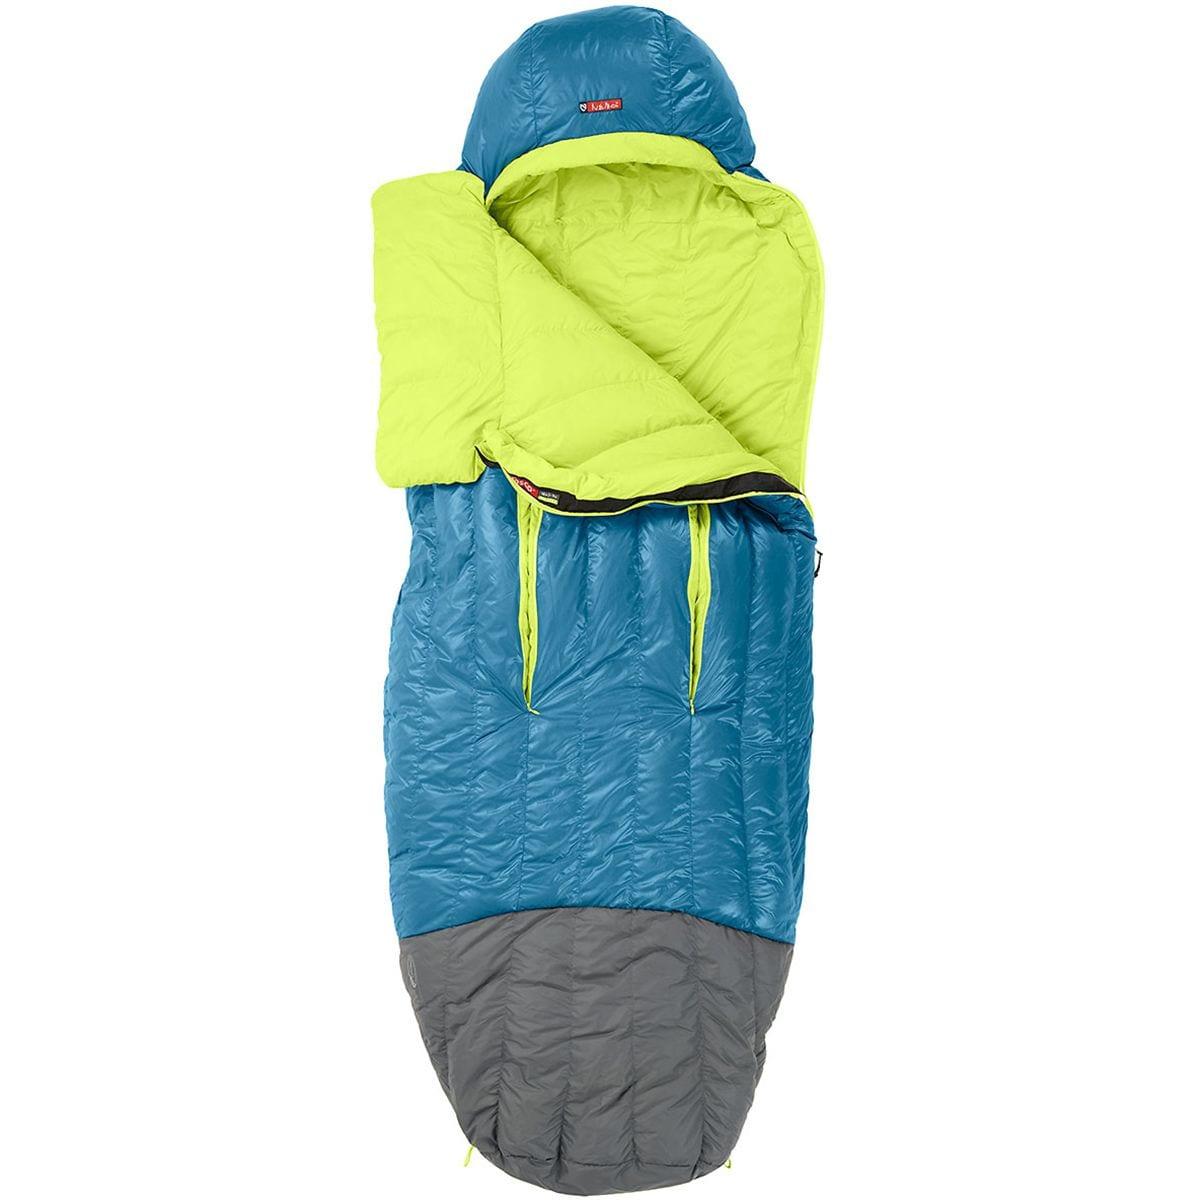 NEMO Equipment Inc. Disco 15 Sleeping Bag: 15 Degree Down One Color, Regular